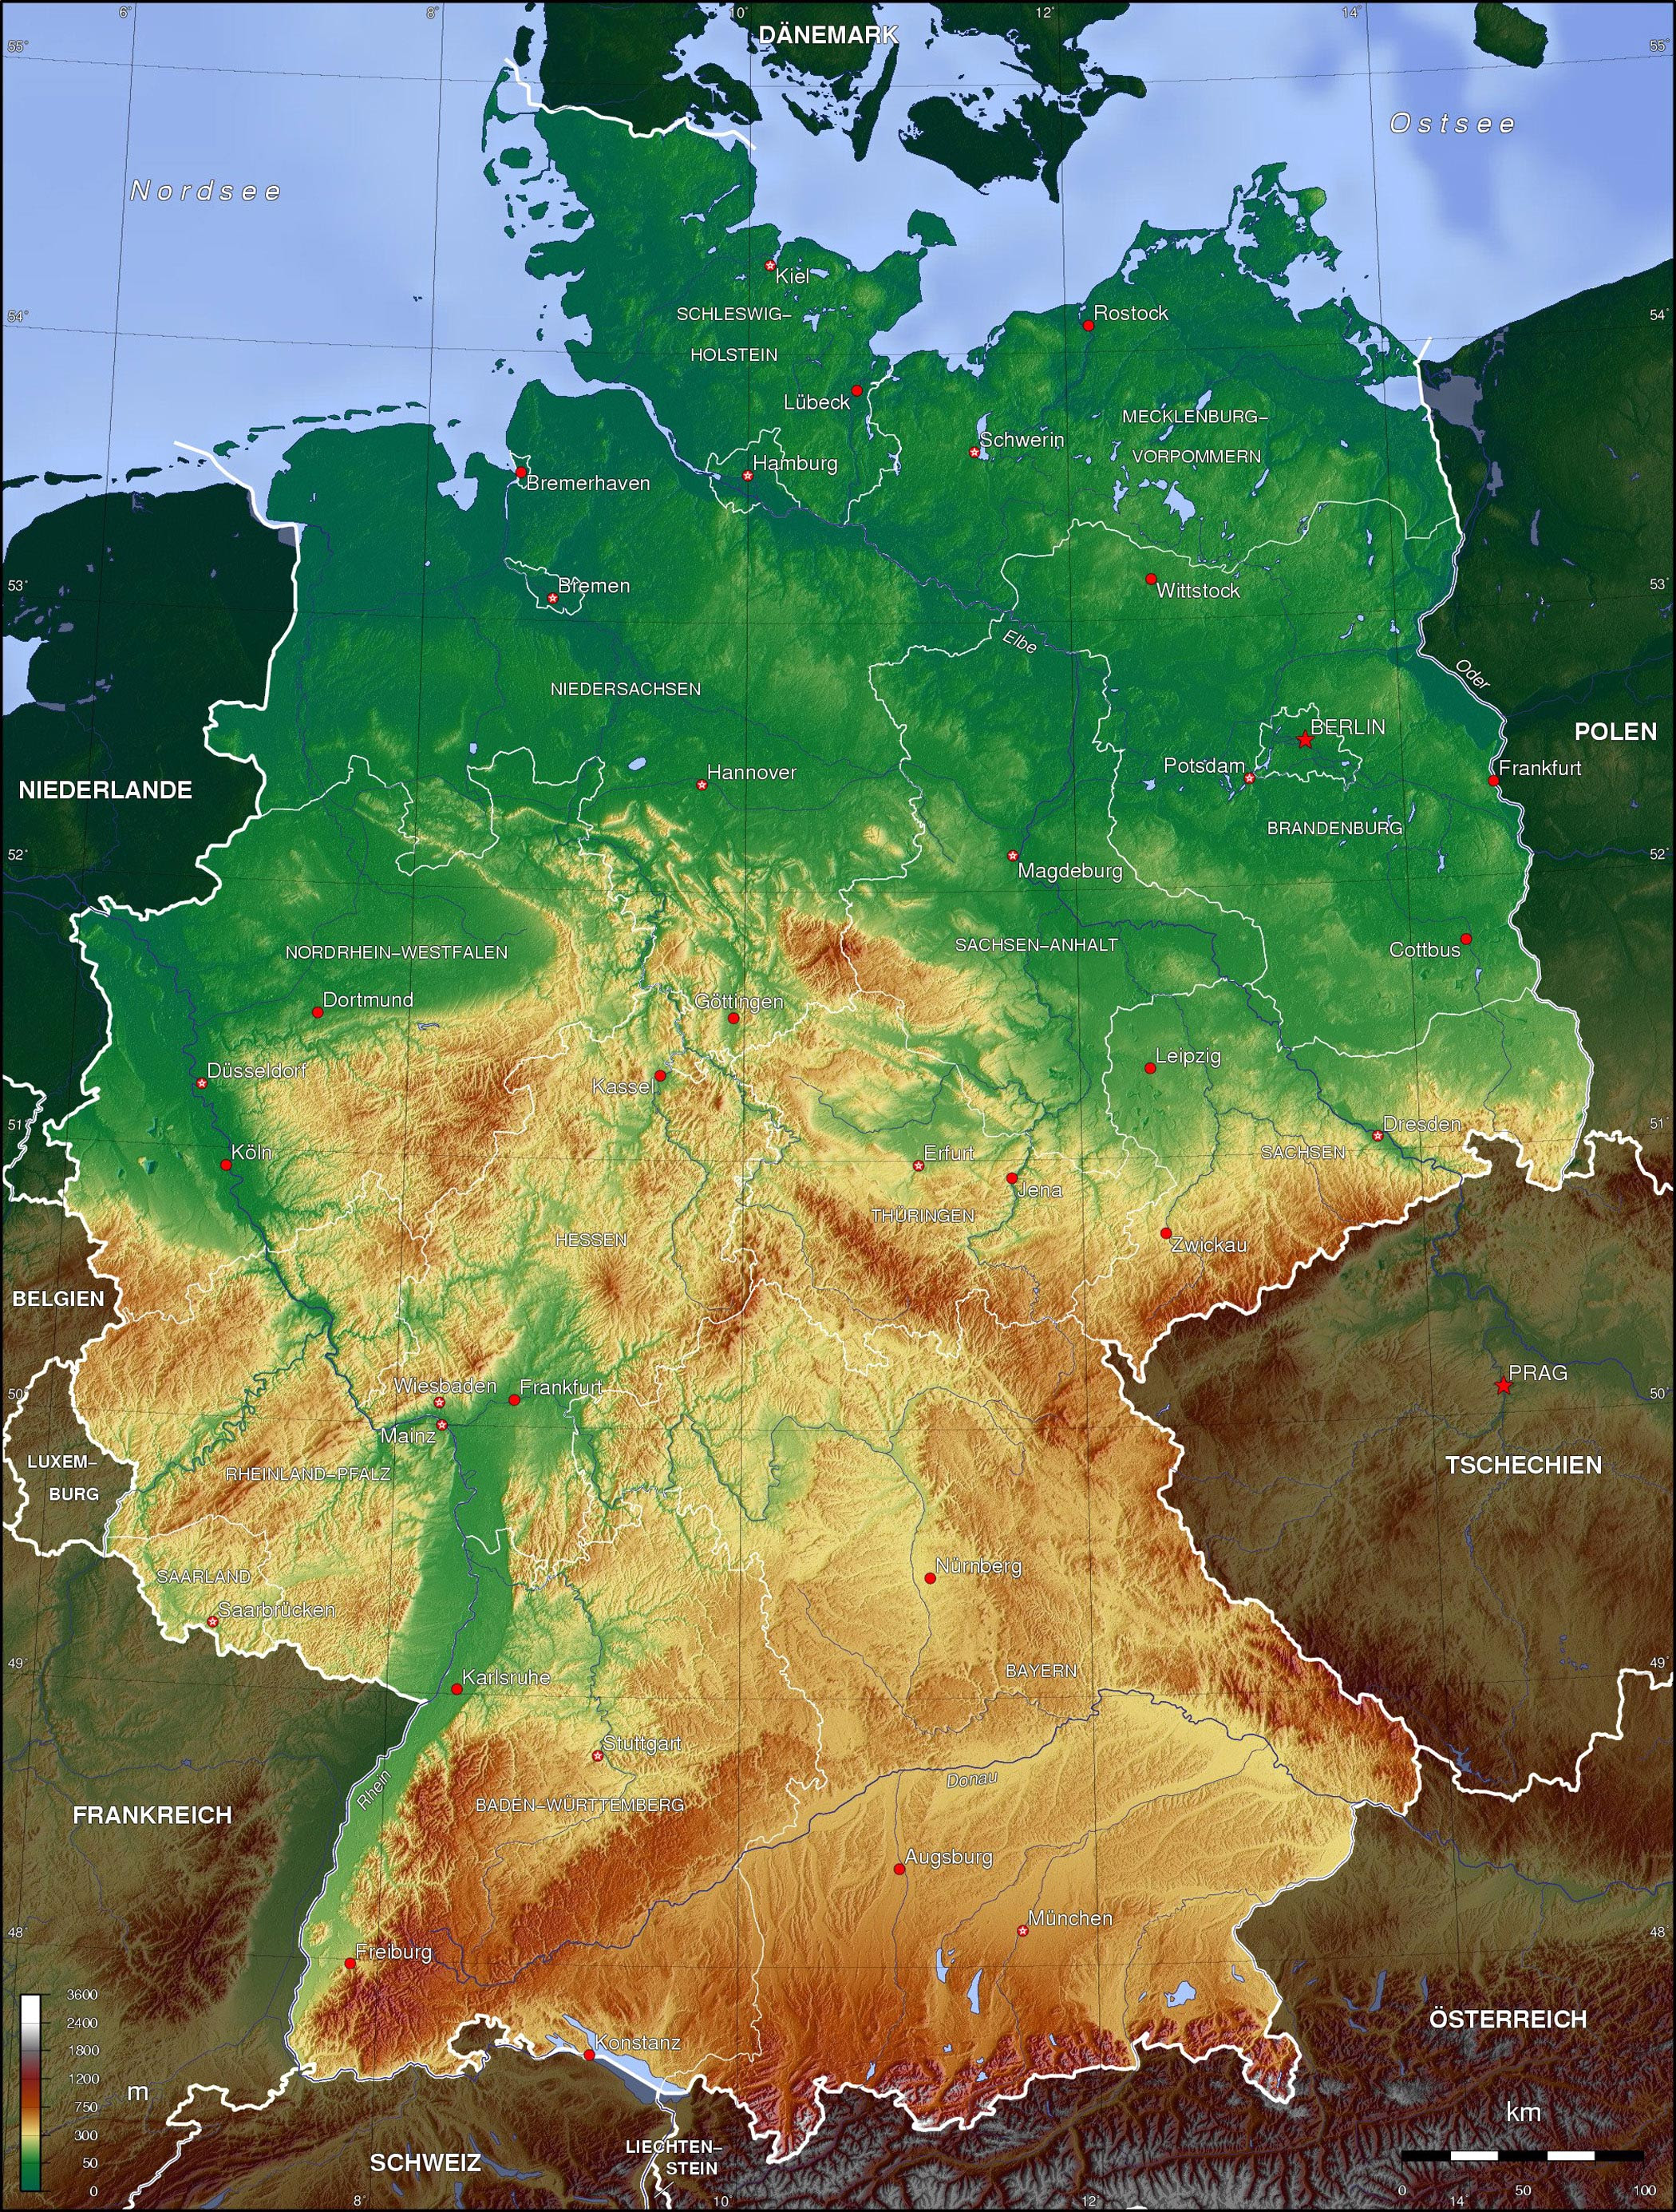 Karten von Deutschland | Karten von Deutschland zum ...